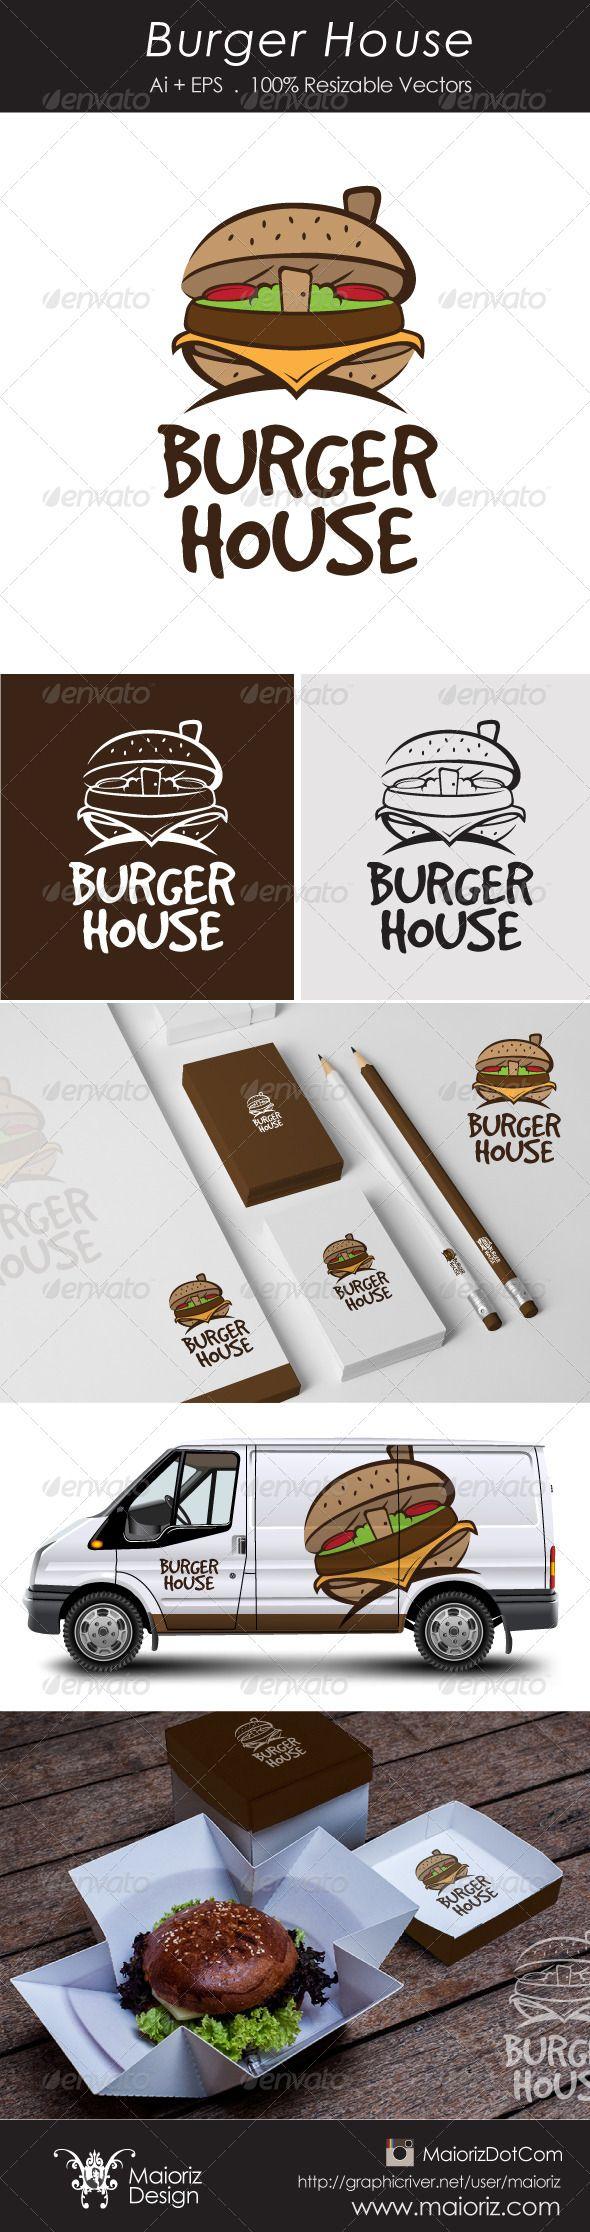 Burger House Logotype - Food Logo Templates